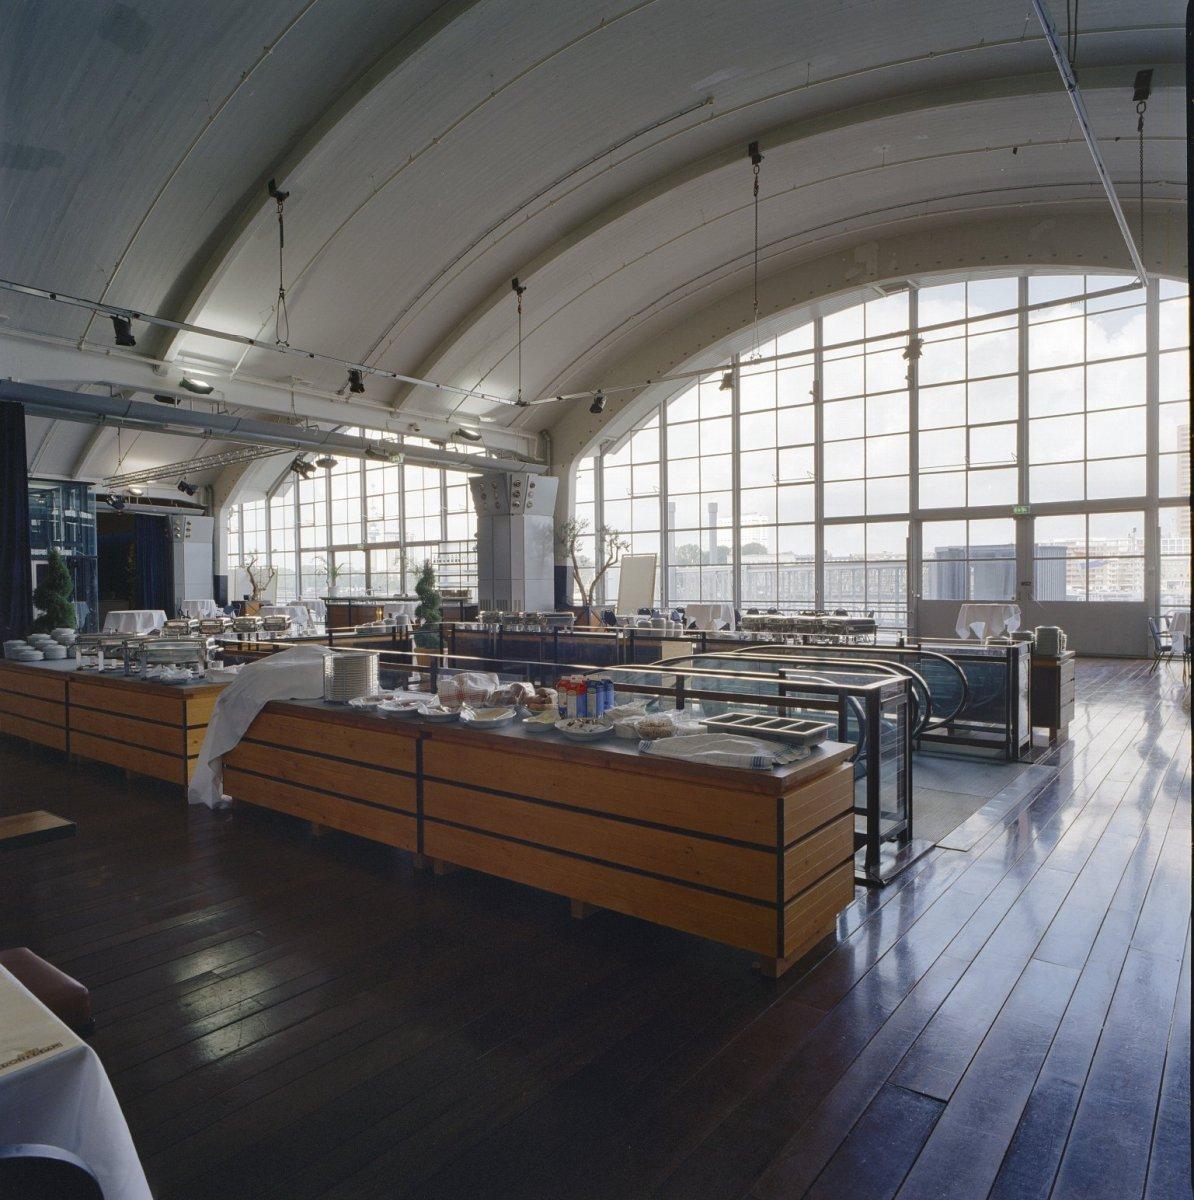 File Interieur Met Glazen Wand Thans Restaurant